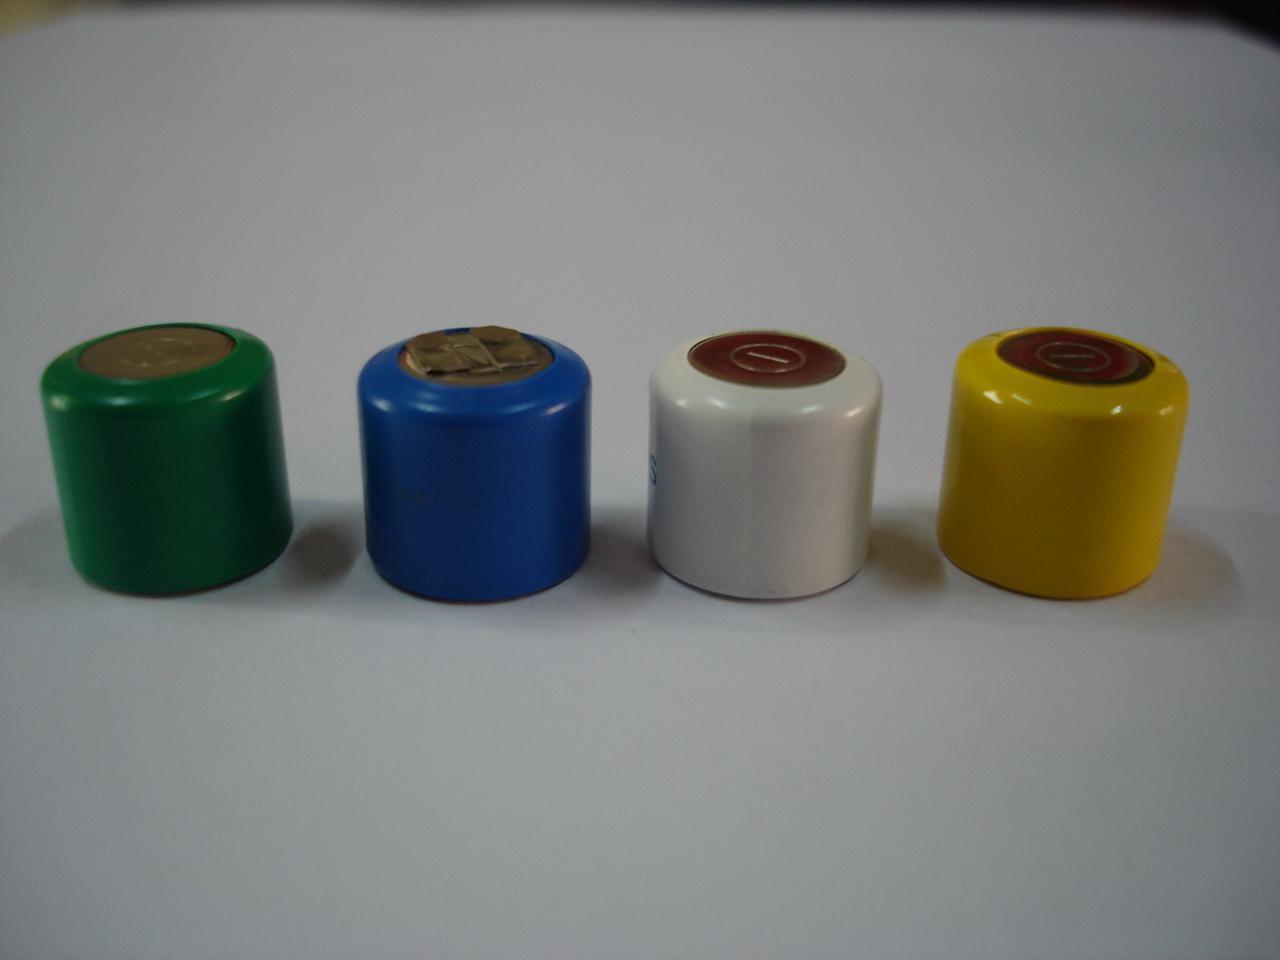 2CR1/3N锂锰电池组 6V 170mAh激光红外线用电池 3